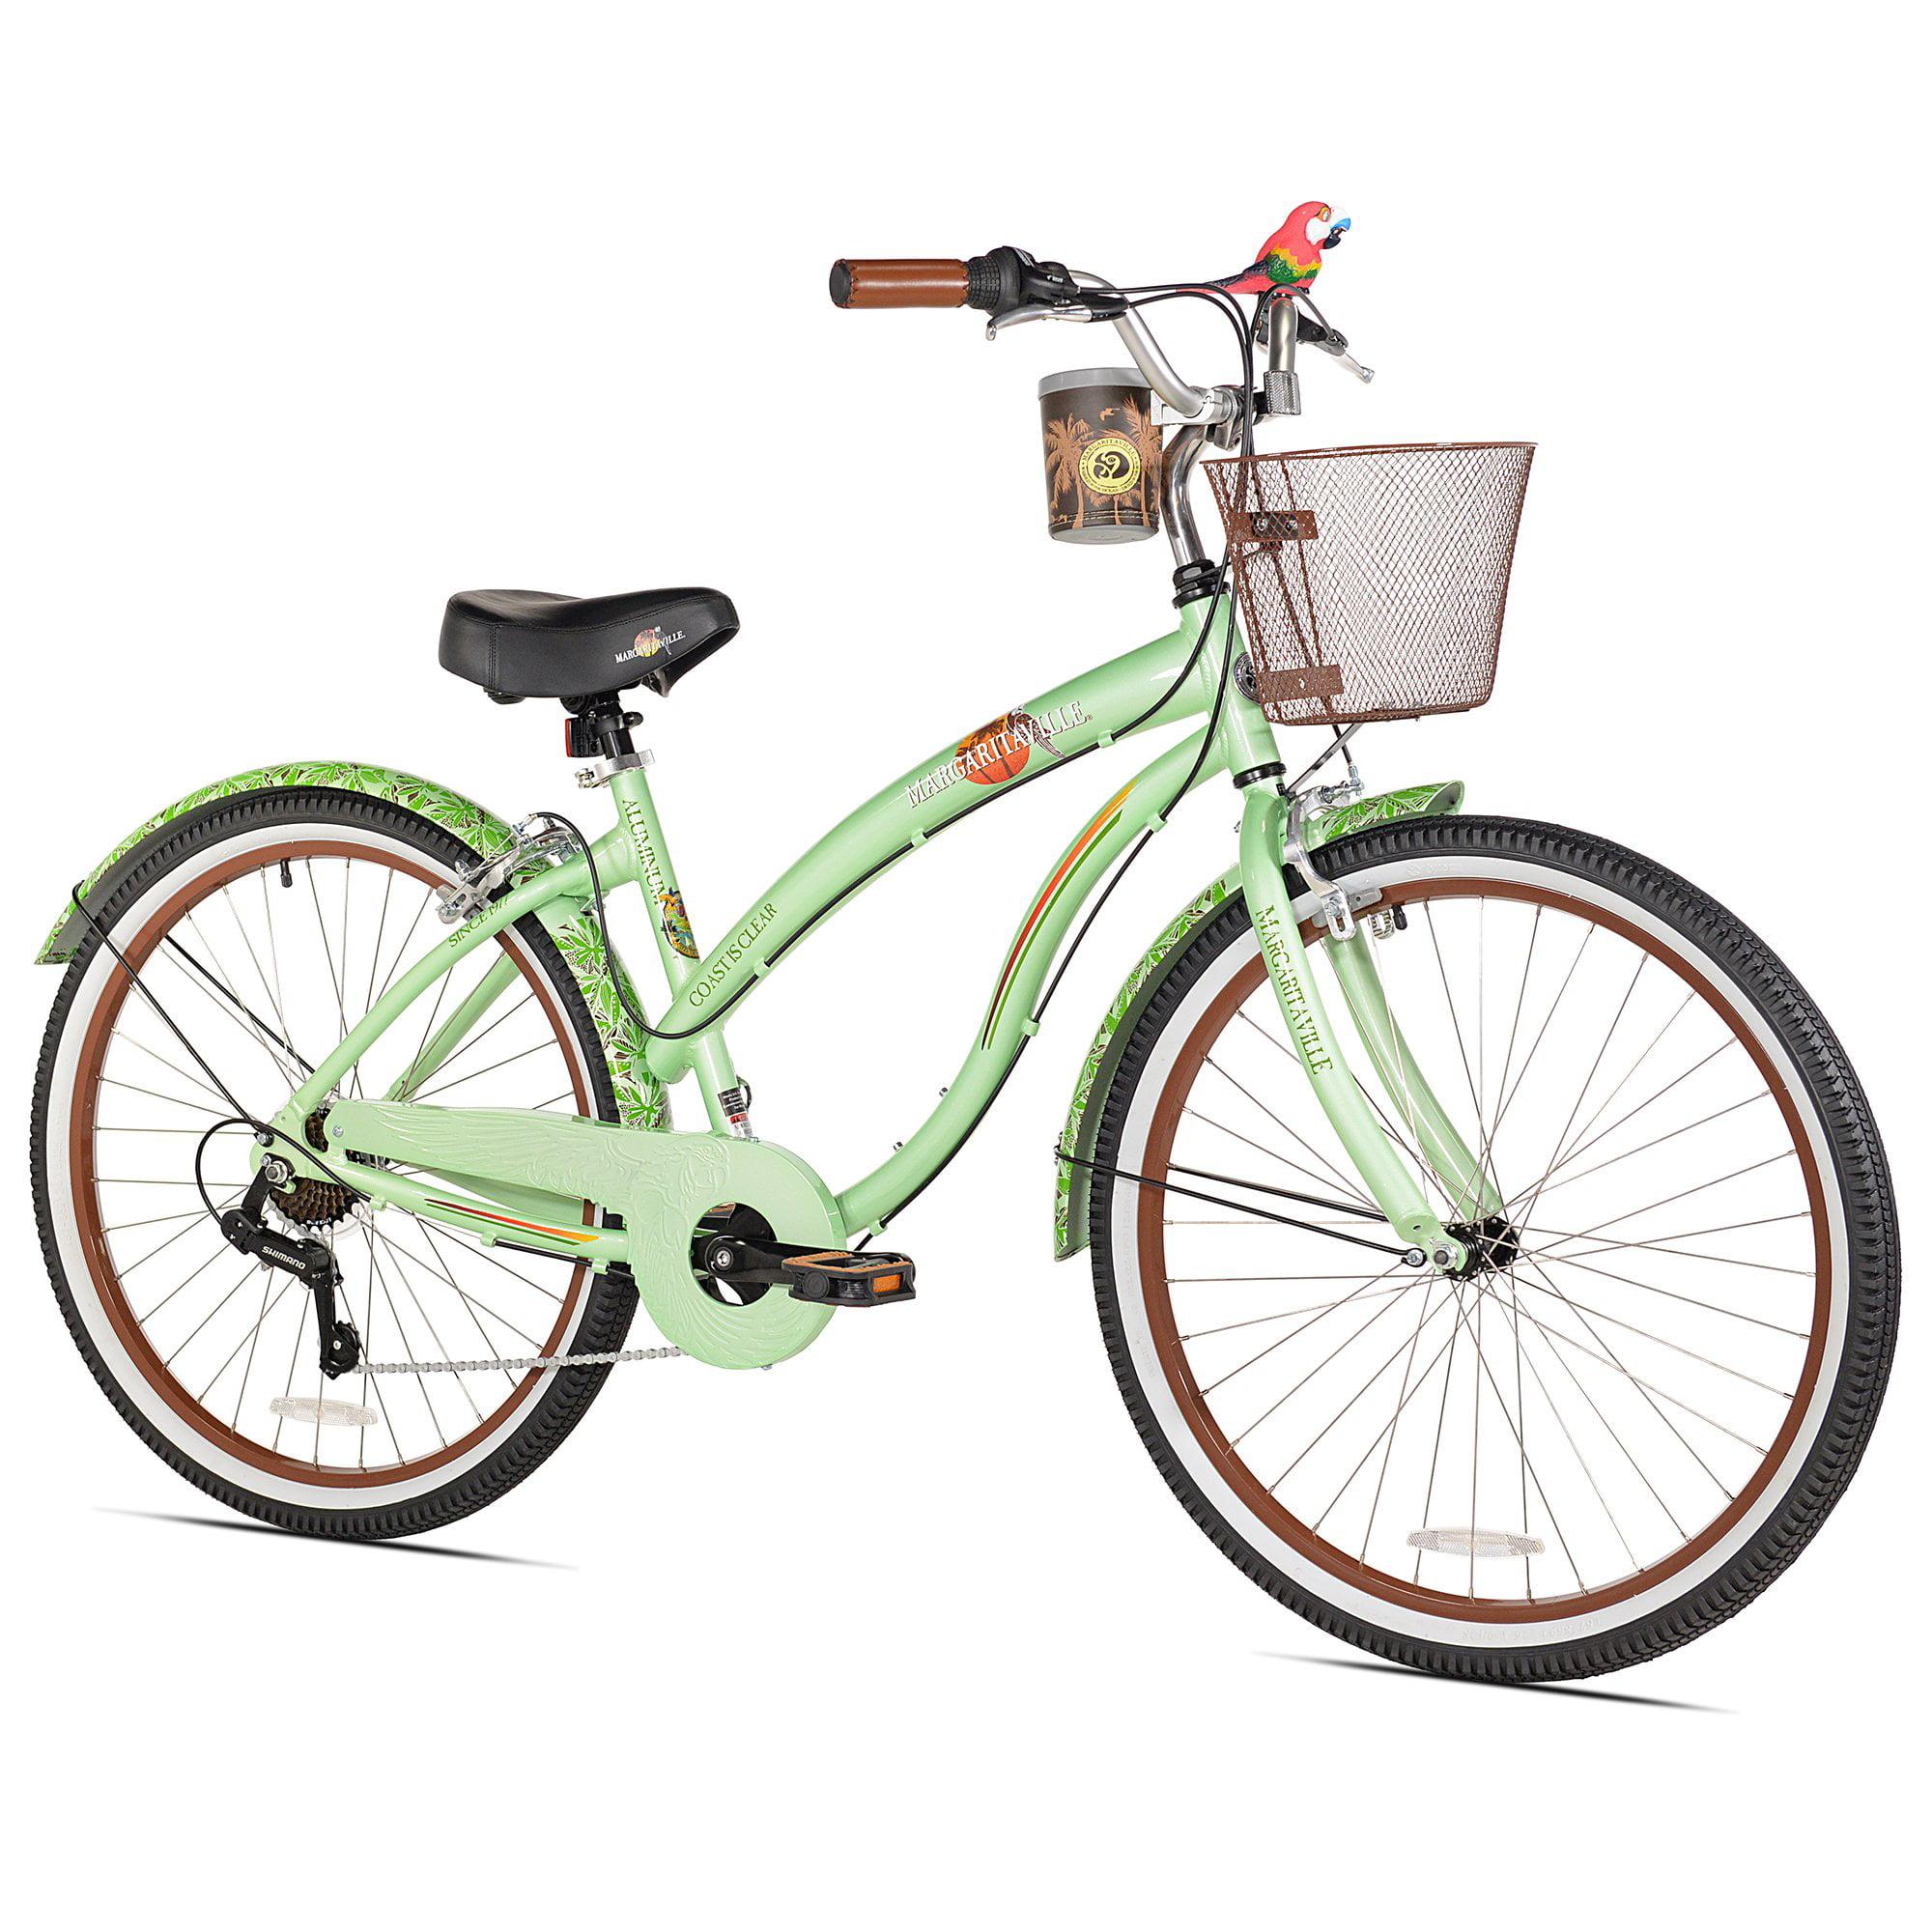 "Margaritaville 26"" Ladies Coast is Clear 7 Speed Cruiser Bike with Bottle Opener"